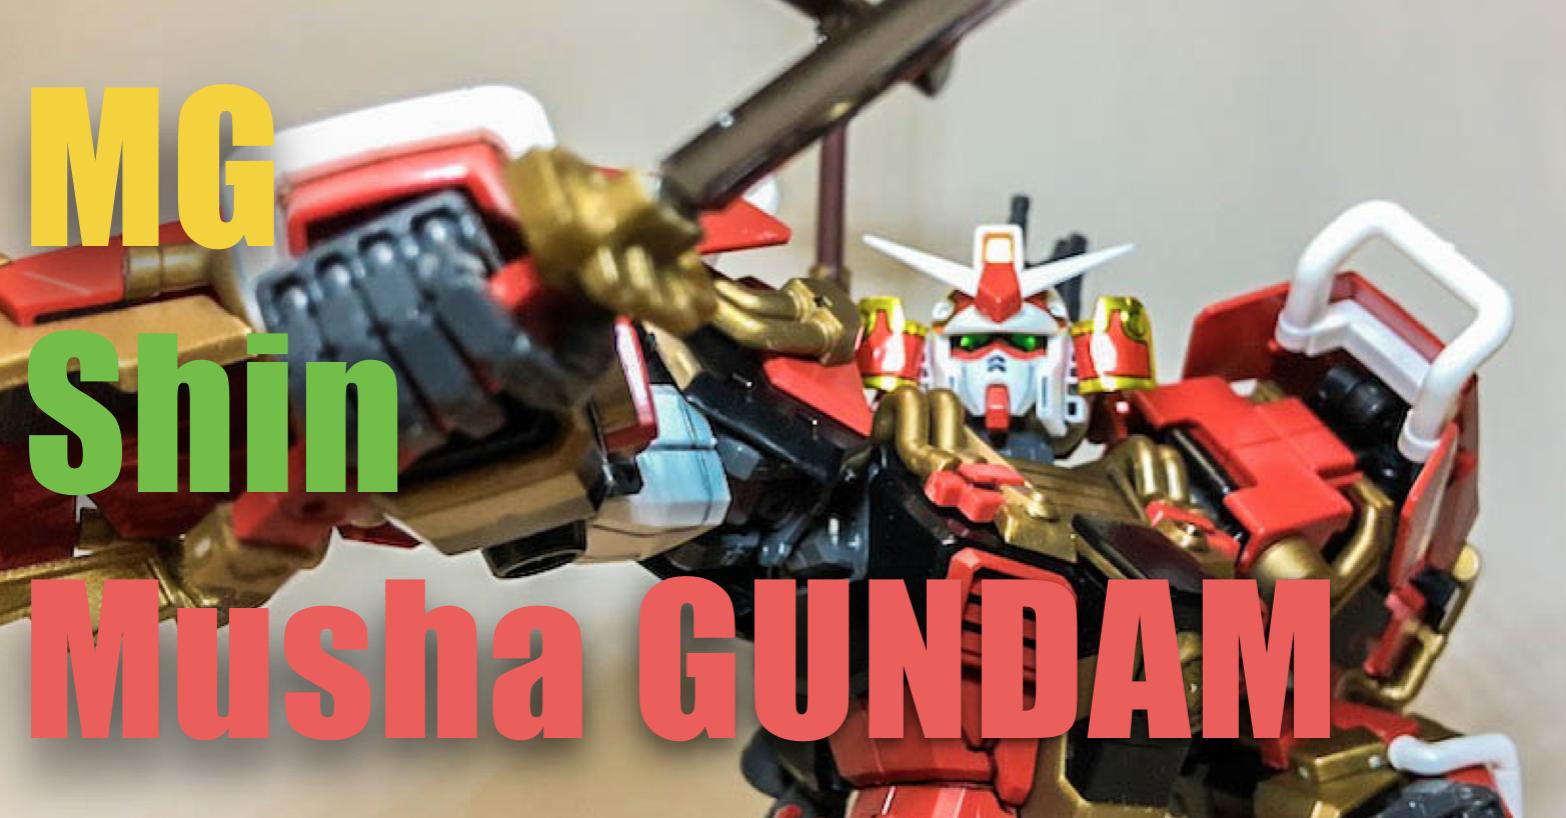 MG『真武者ガンダム』のガンプラがワクワクすぎるのでレビューするぞ!